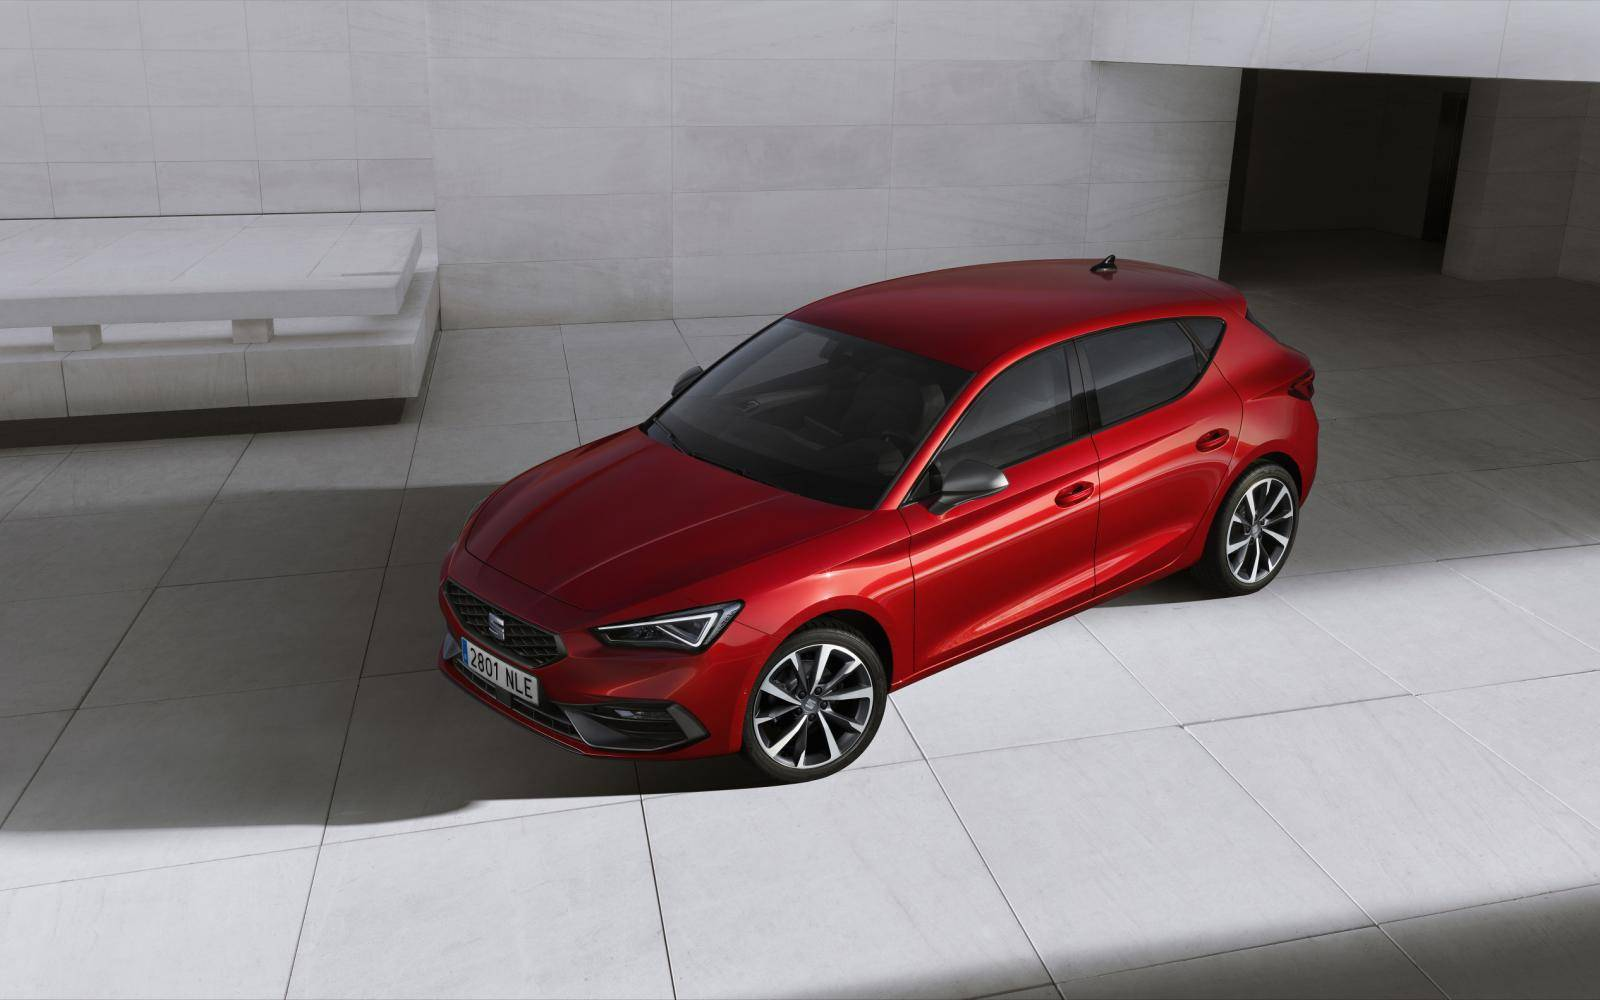 Nieuwe Seat Leon: Spaanse Volkswagen Golf is weer spannend